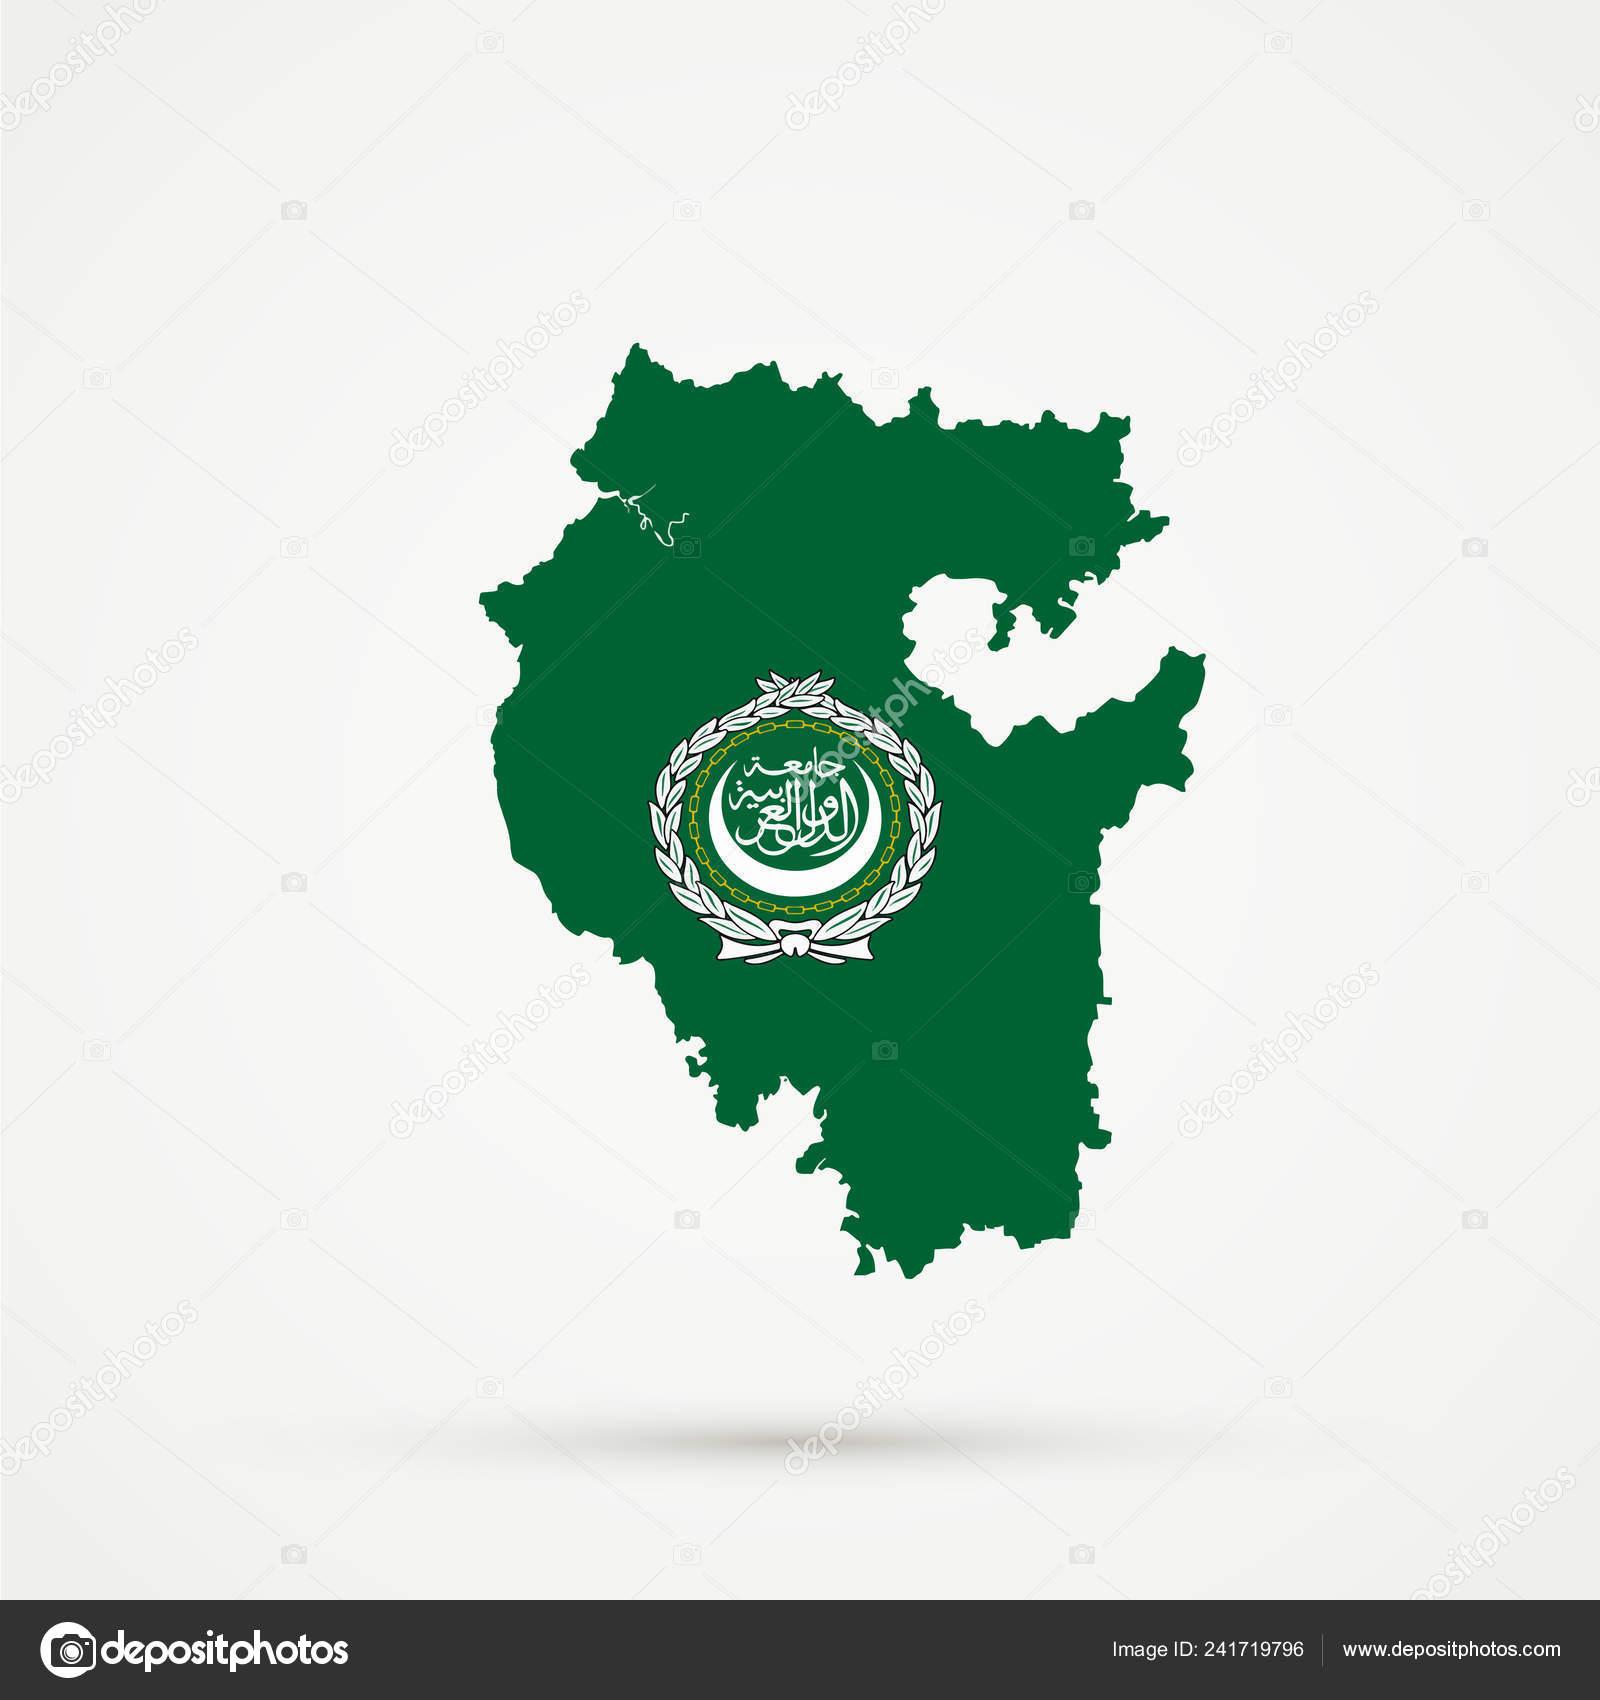 Picture of: Bashkortostan Map Arab League Flag Colors Editable Vector Stock Vector C L8l 241719796